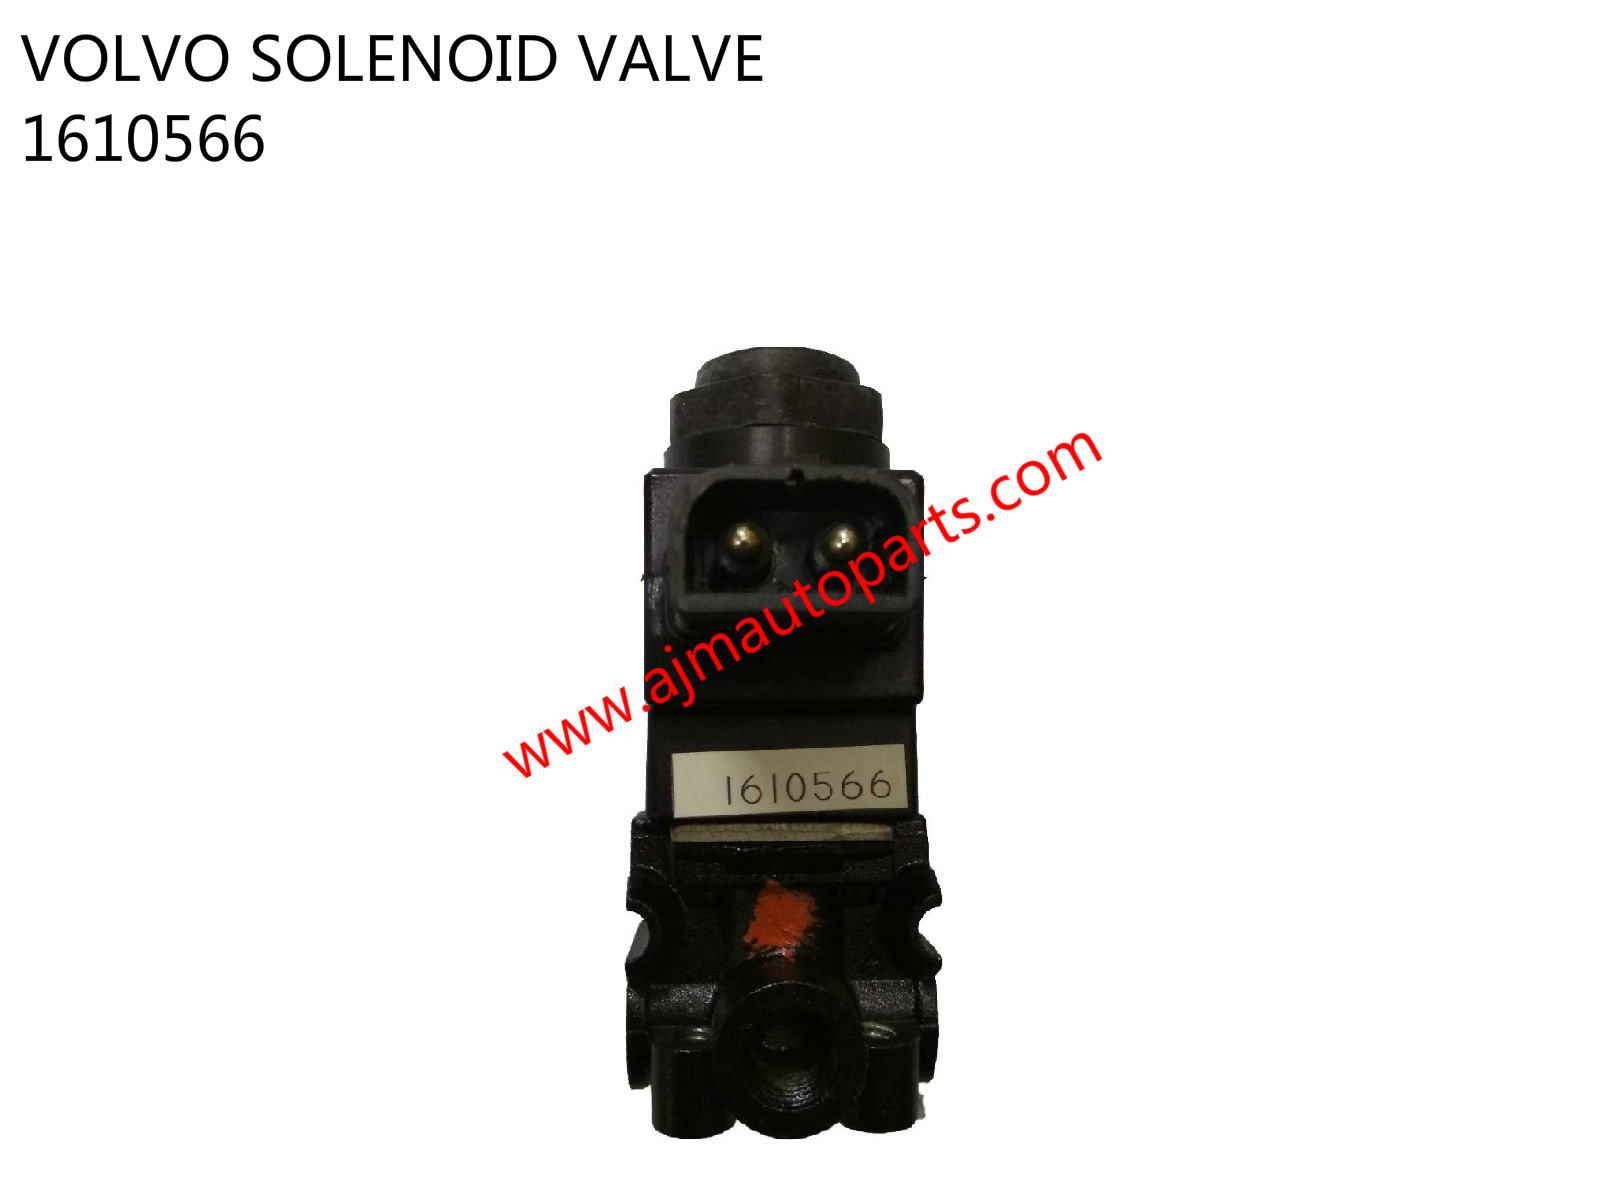 VOLVO SOLENOID VALVE-1610566